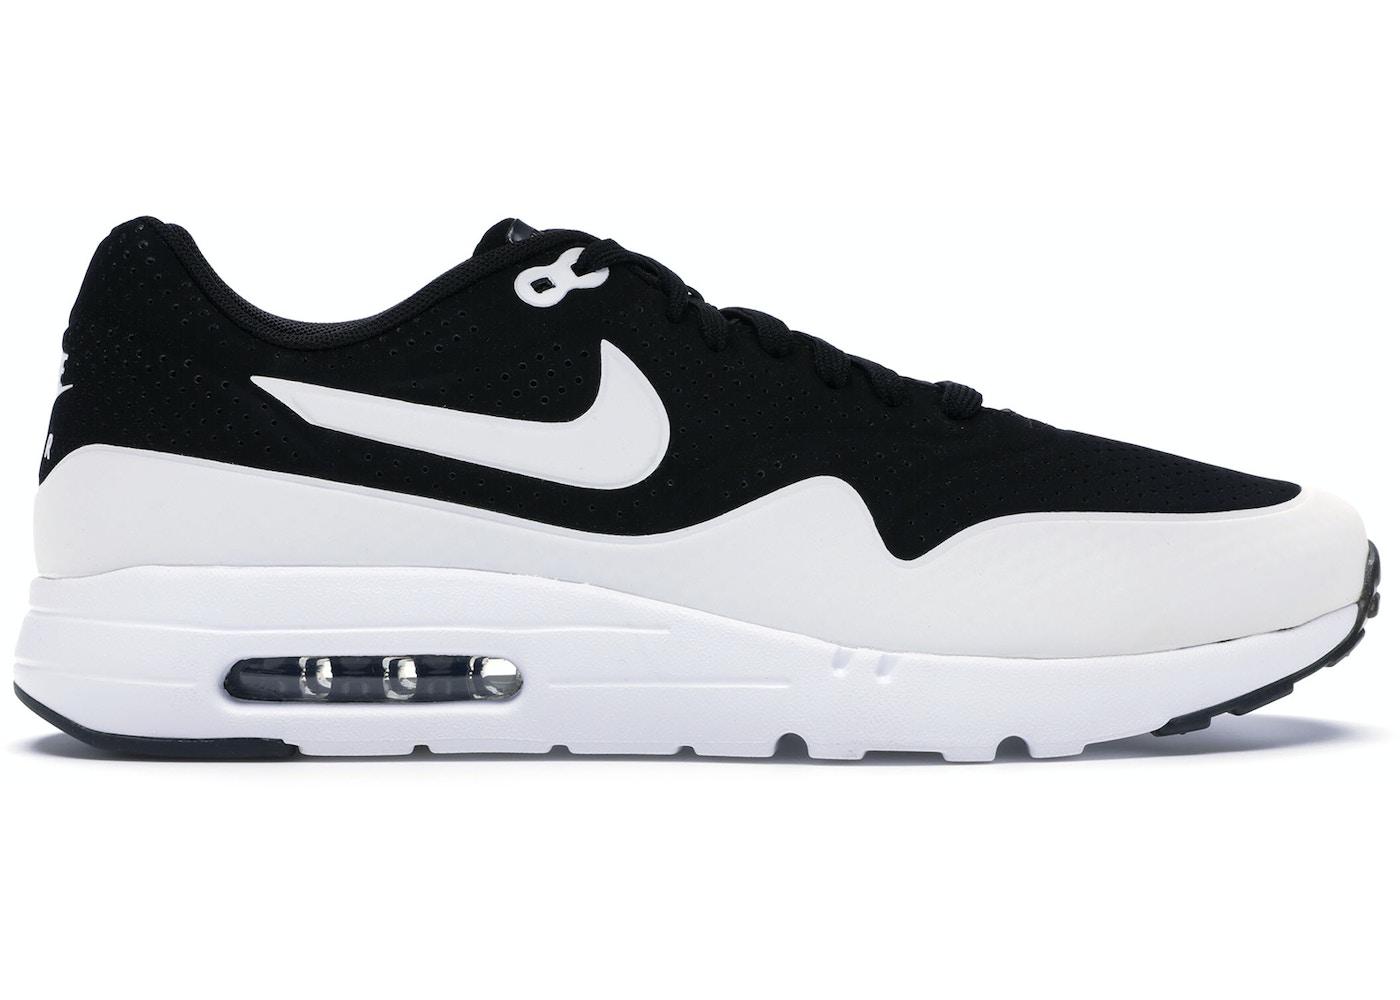 objetivo excusa Peregrino  Nike Air Max 1 Ultra Moire Black White - 705297-001